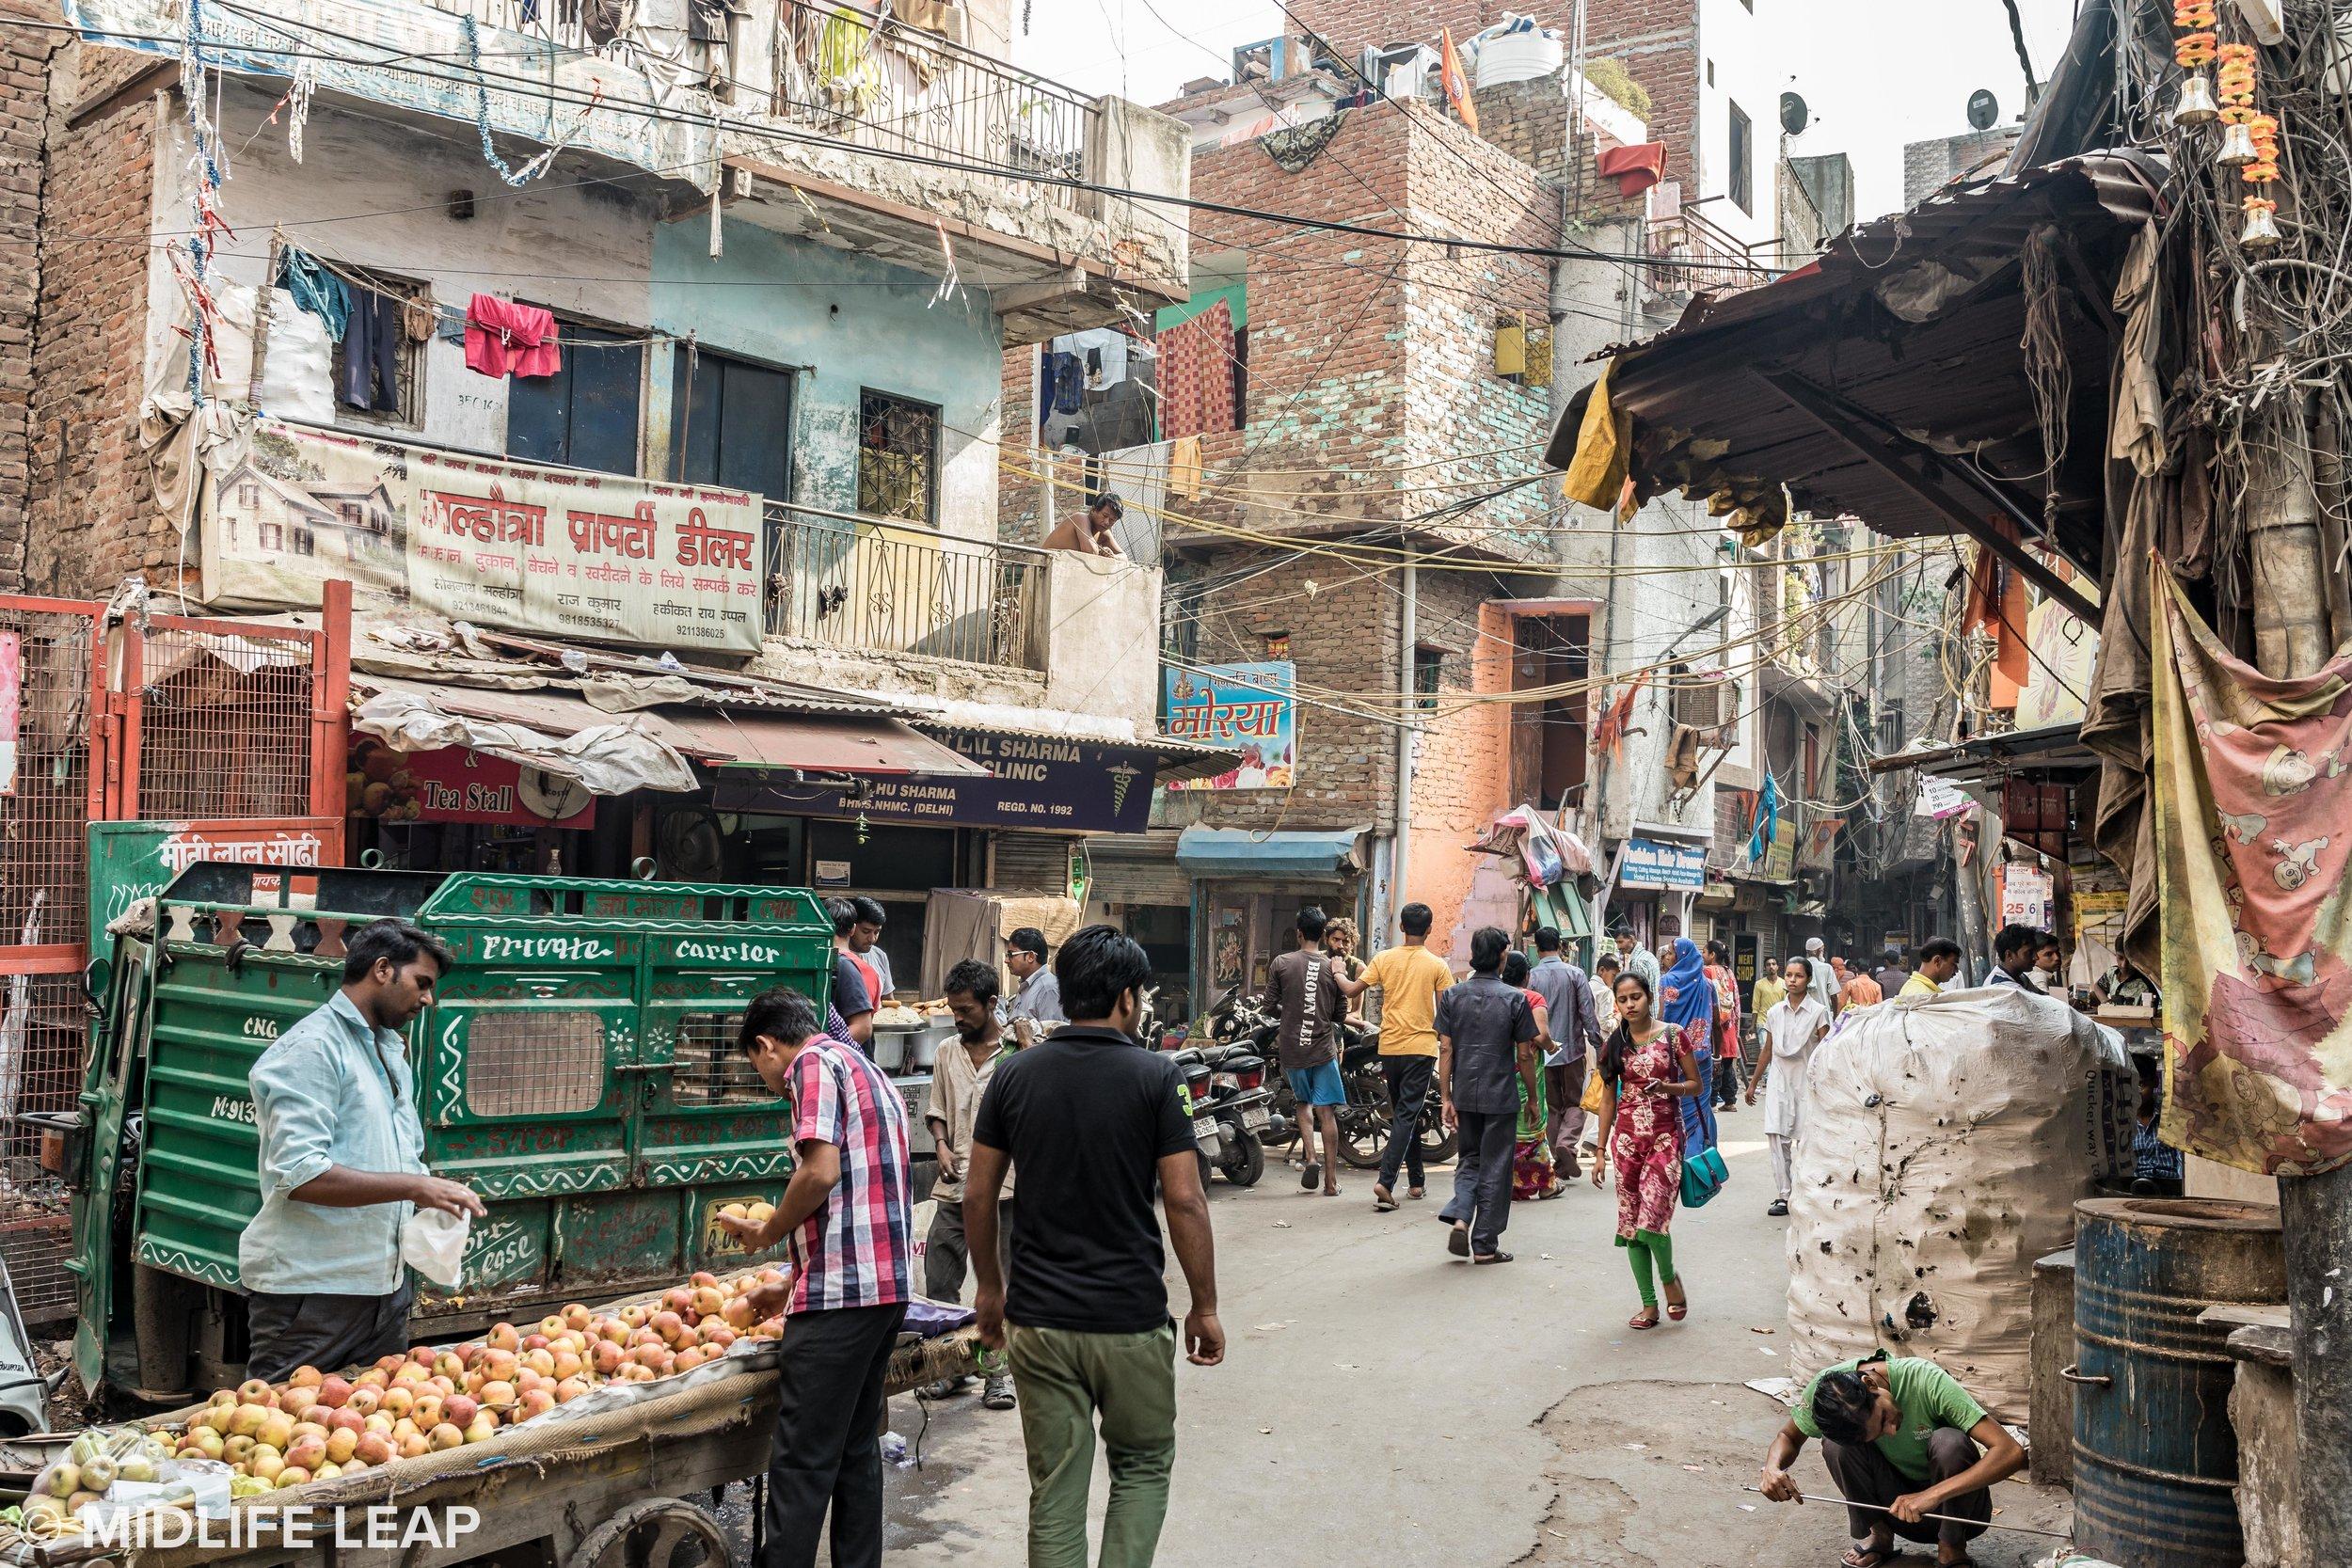 street-scenes-new-delhi-india.jpg